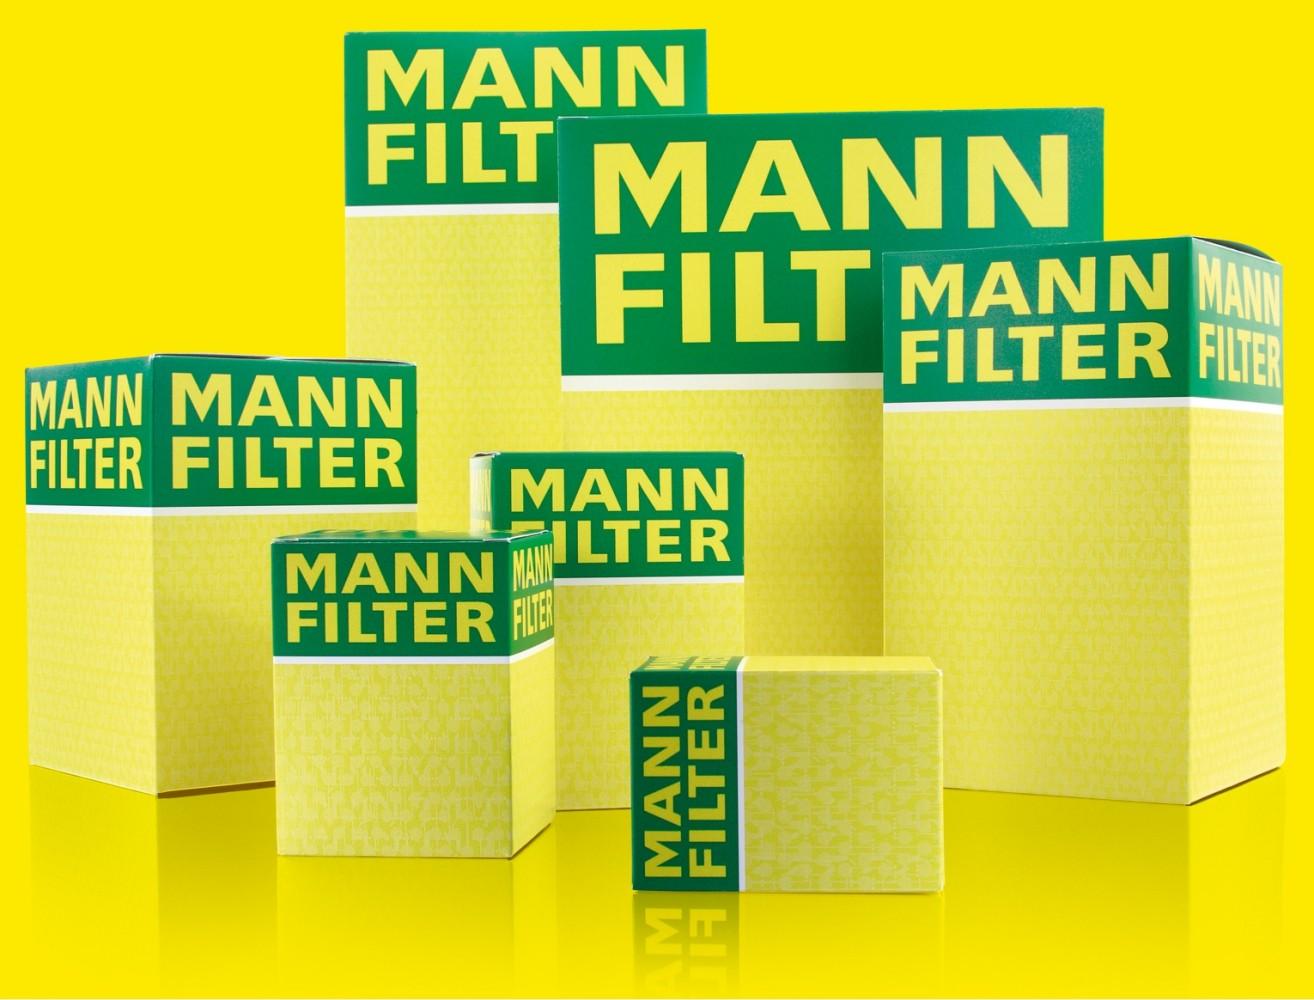 Pachet revizie MANN E270 CDI (211.016/216)